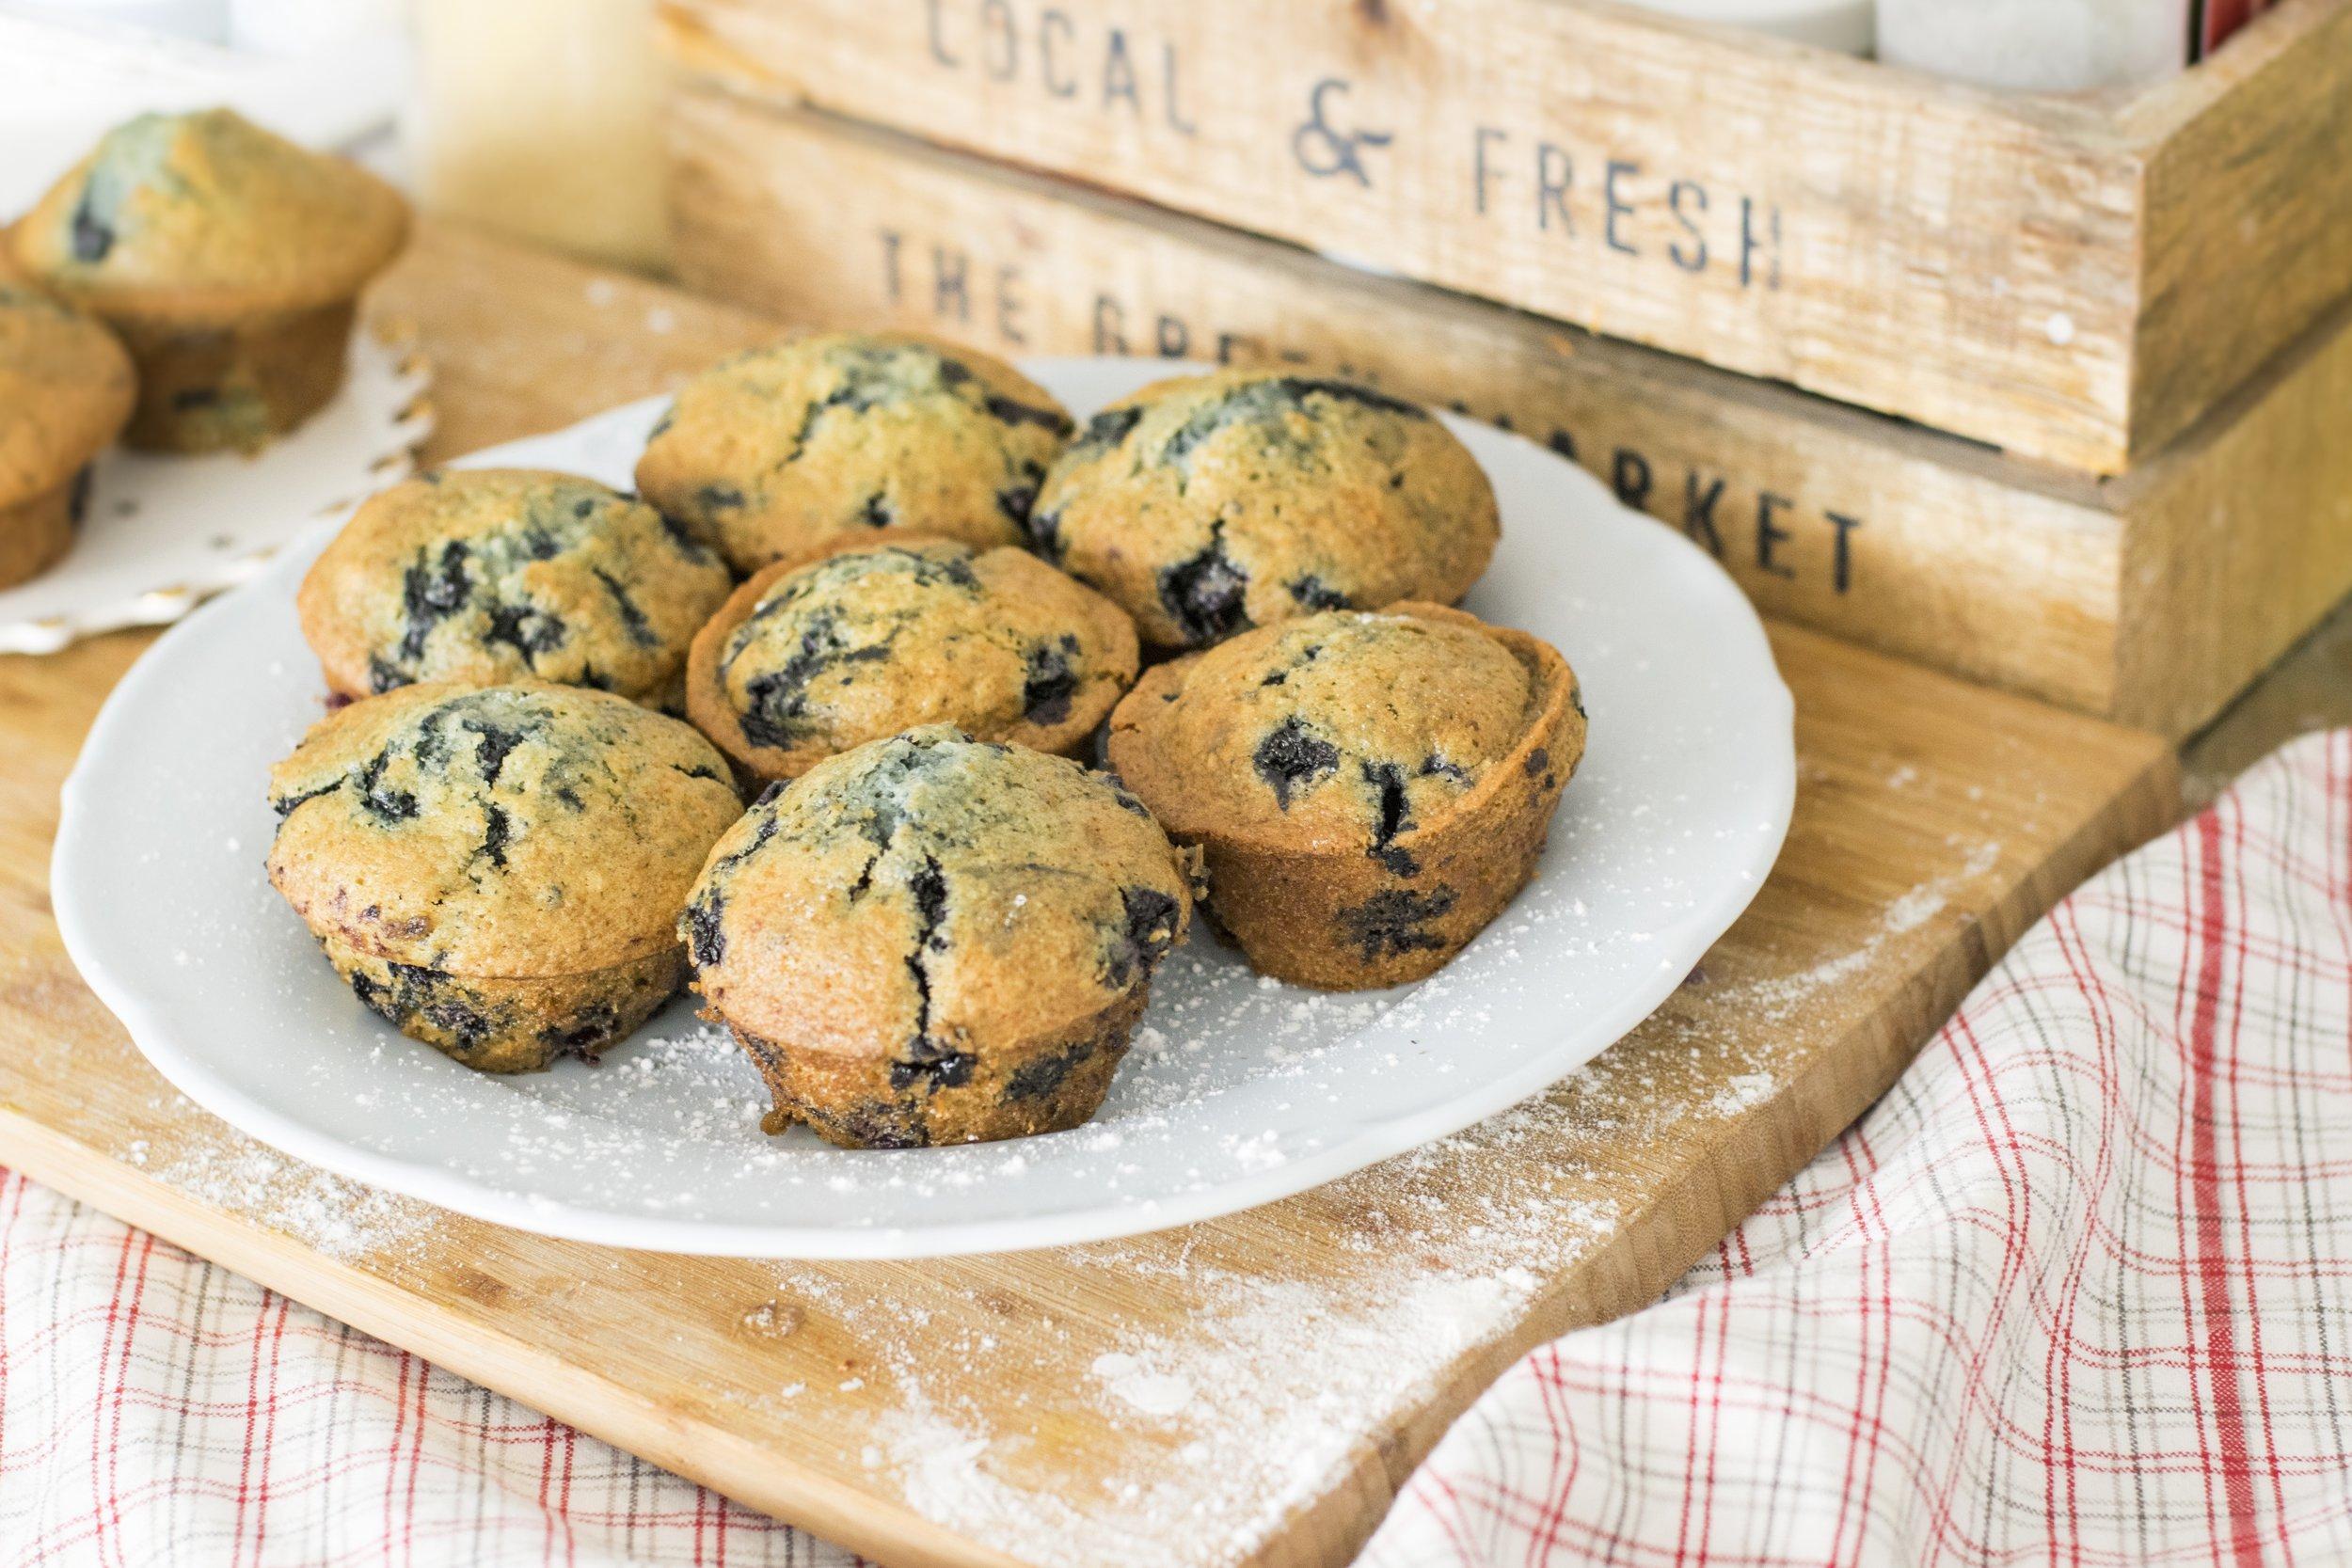 muffin-bakery-baking-357623.jpg